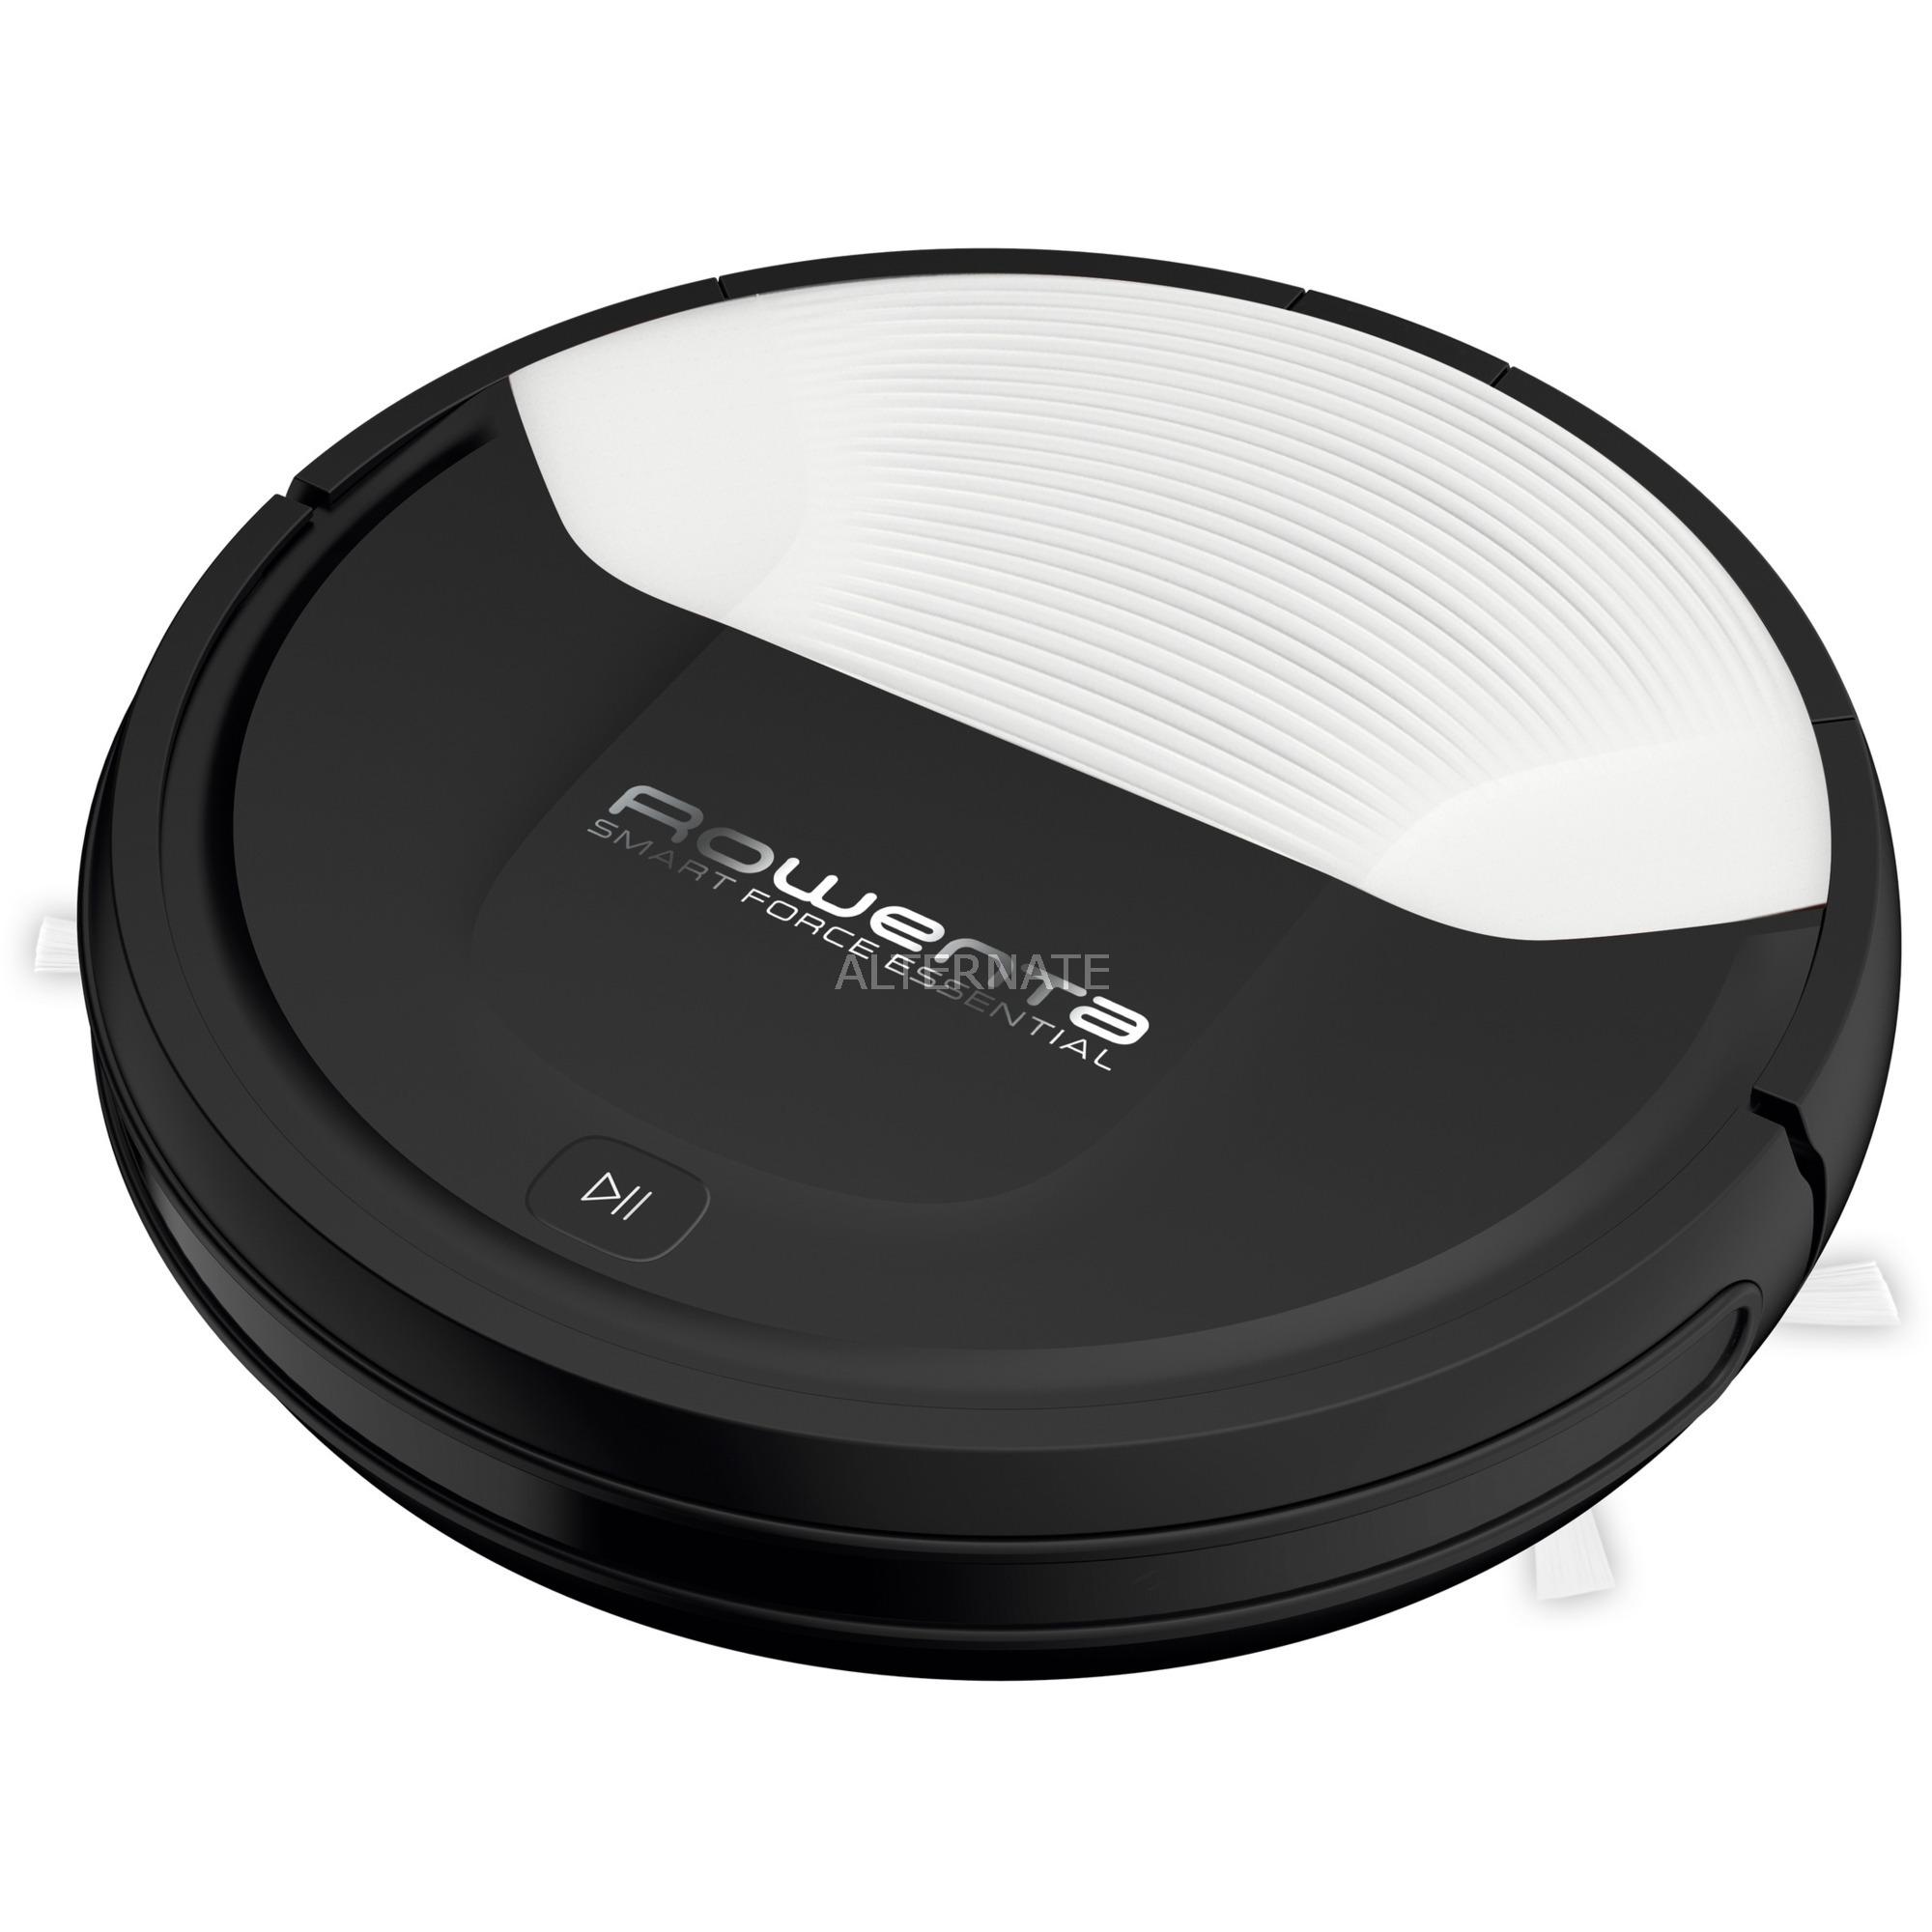 Smart Force Essential RR6927 aspiradora robotizada Sin bolsa Negro, Blanco 0,25 L, Robot aspirador